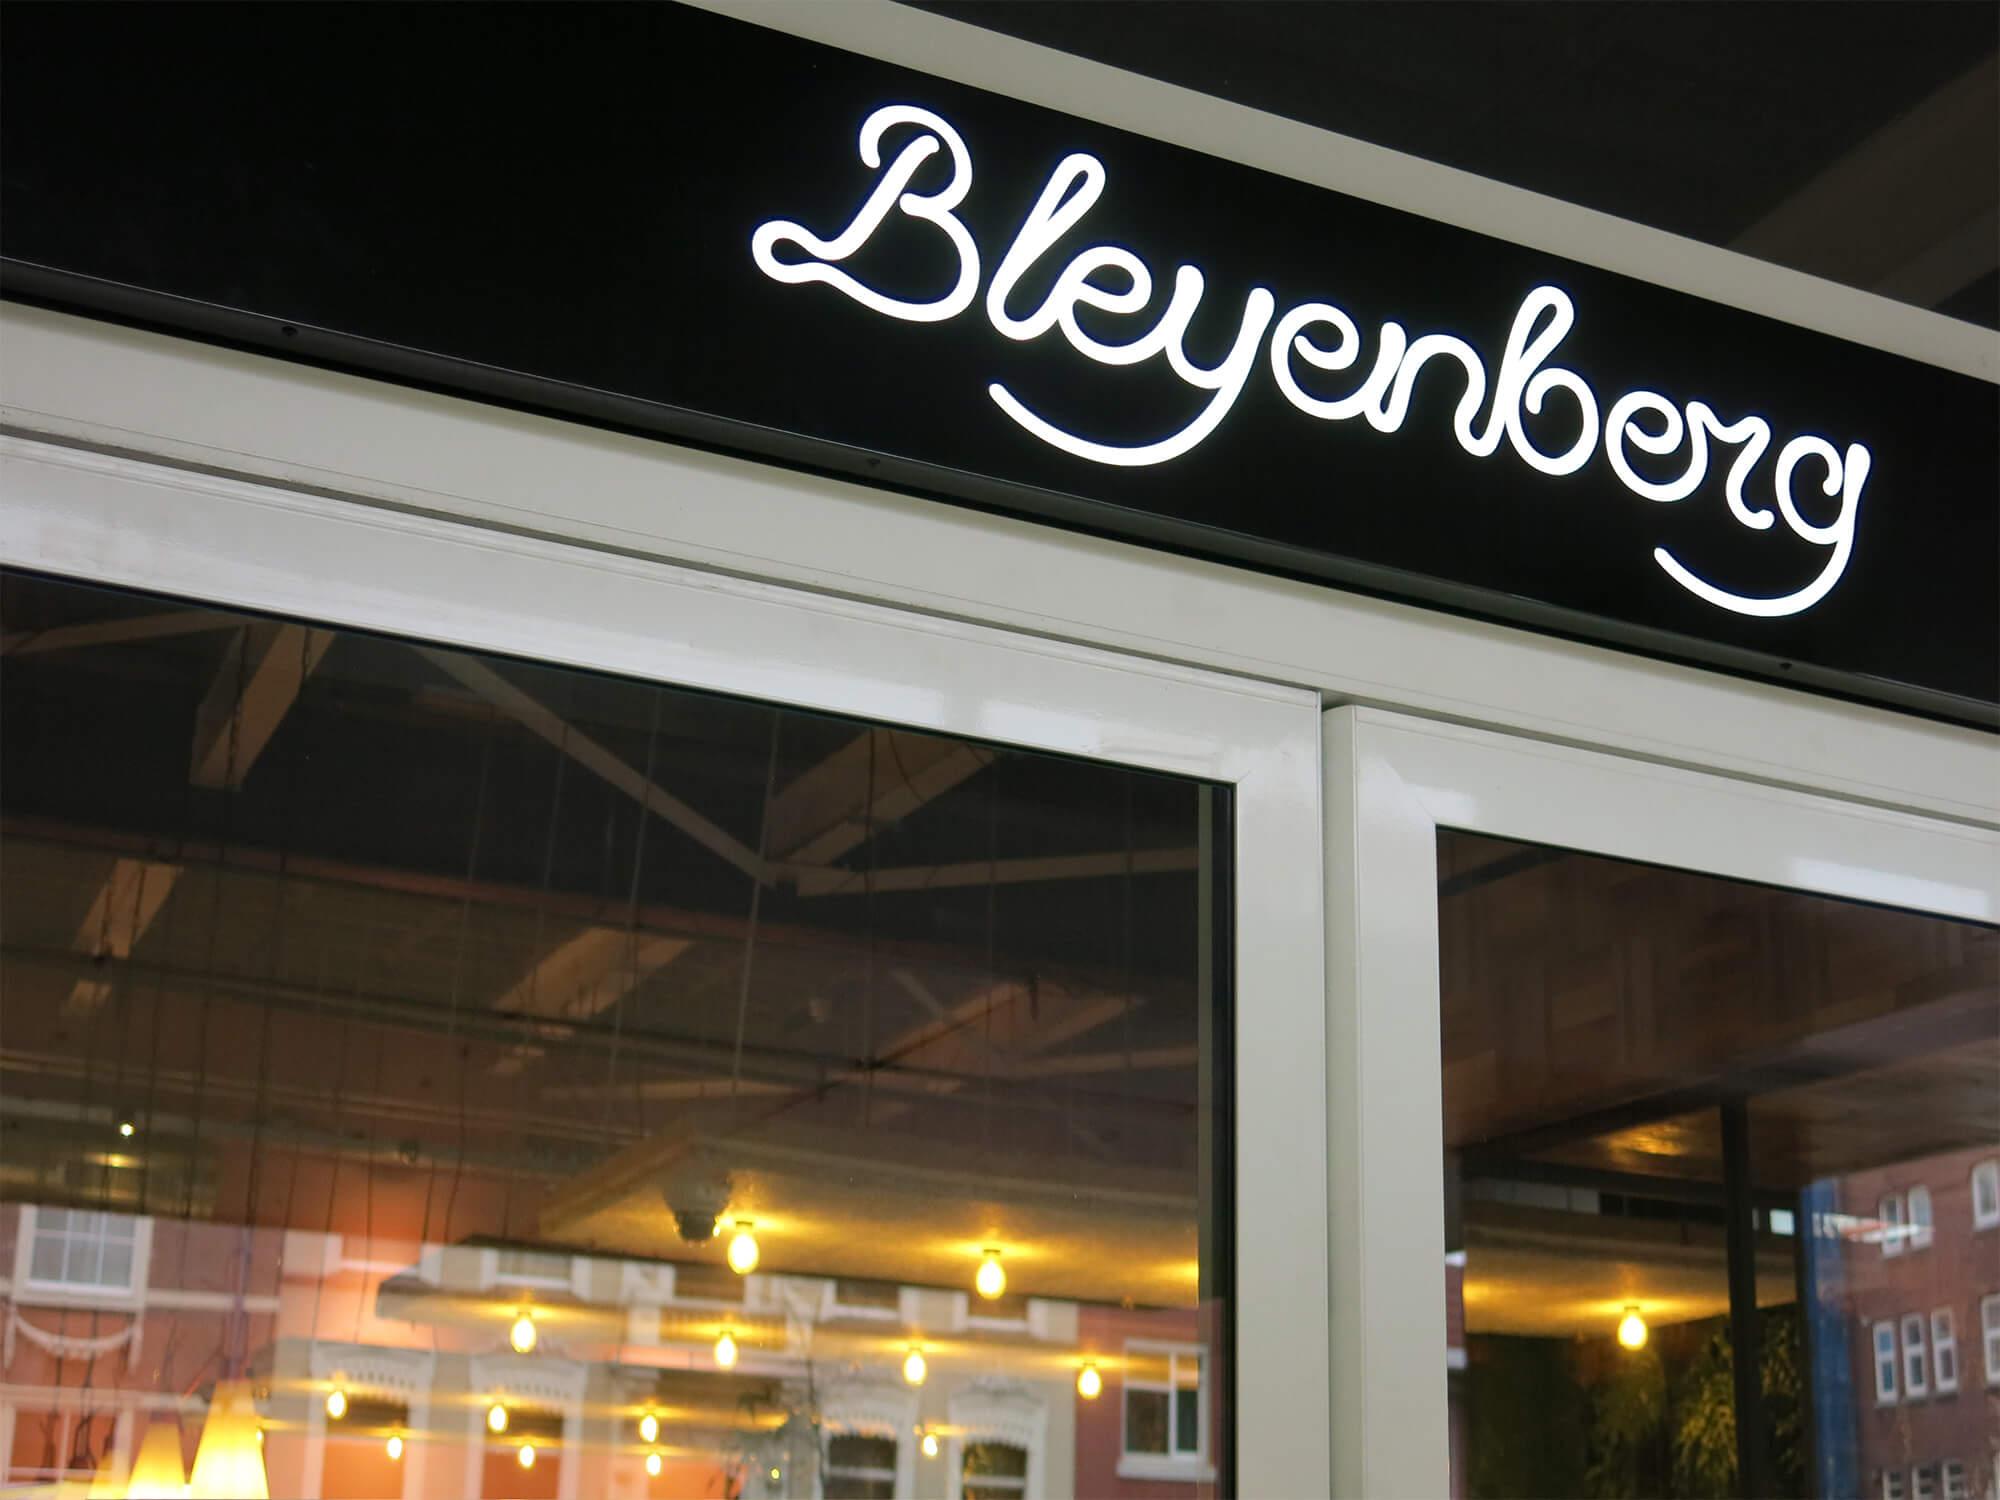 kapowski_bleyenberg_outdoor sign_3